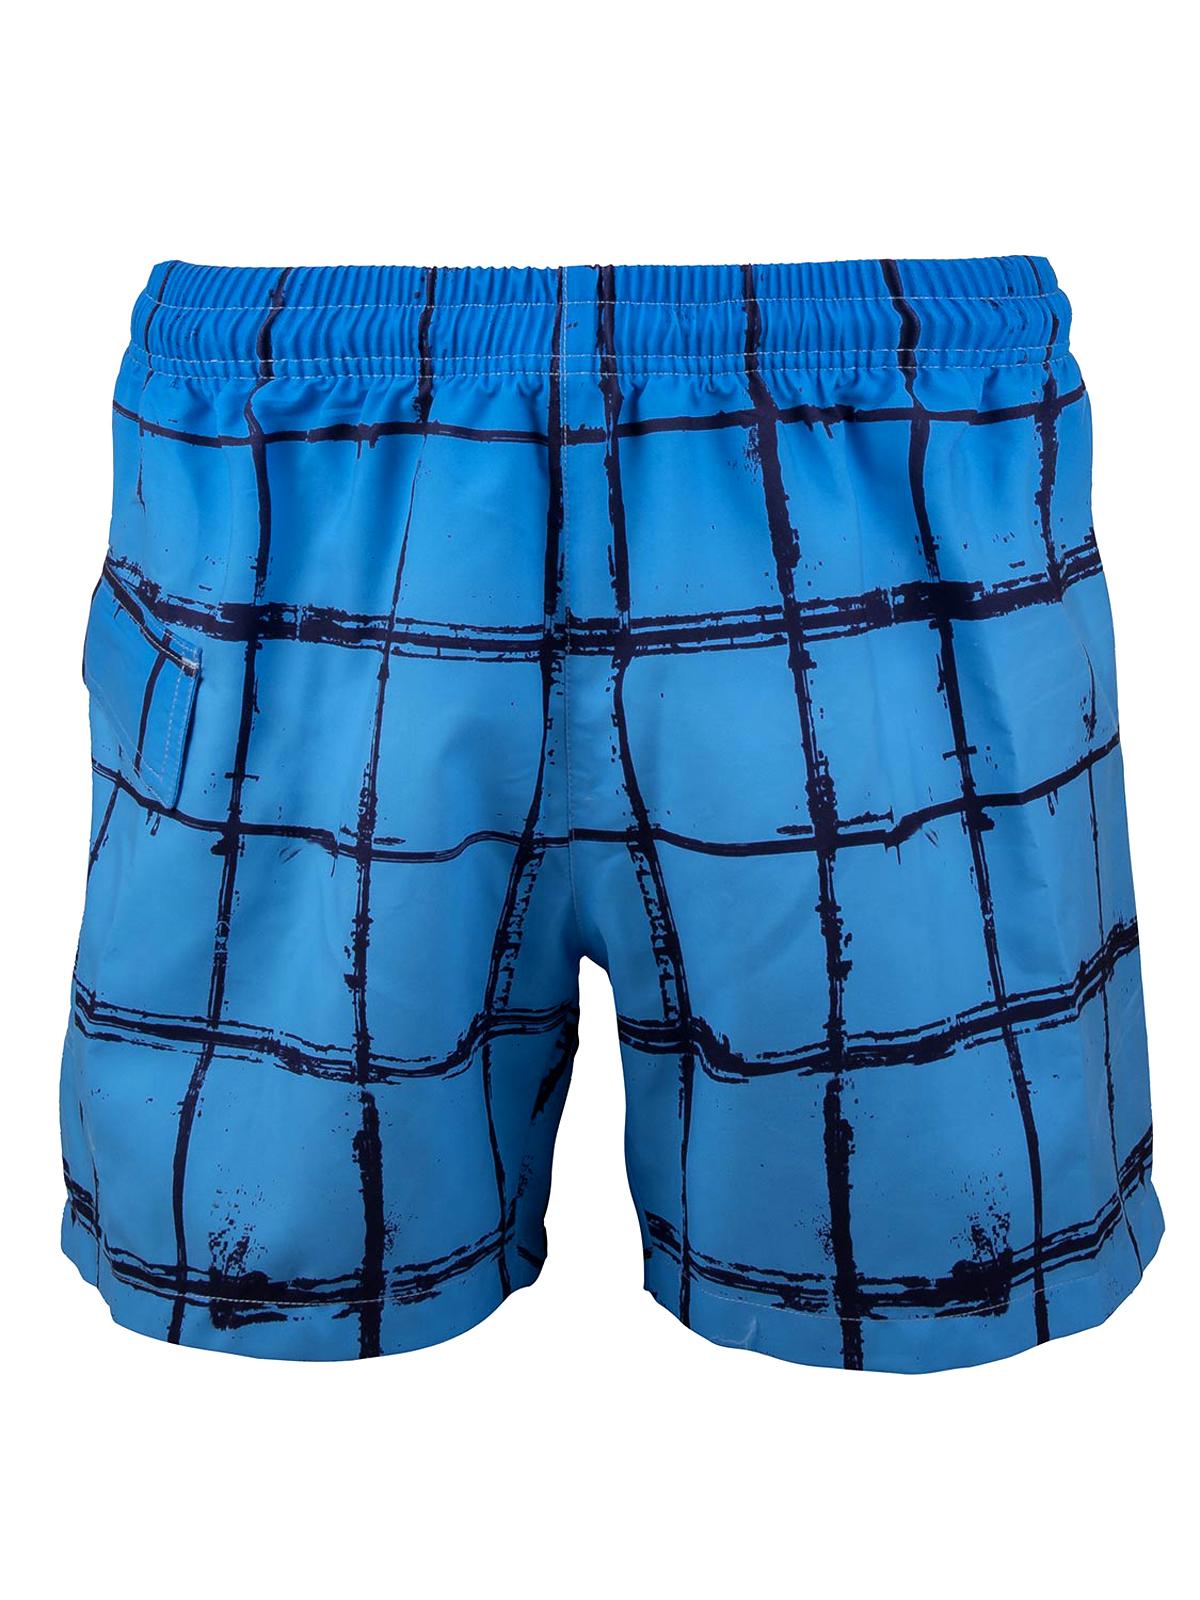 6922f7f844 Naturana - - Naturana BLUE Checked Swimming Trunks - Size Medium